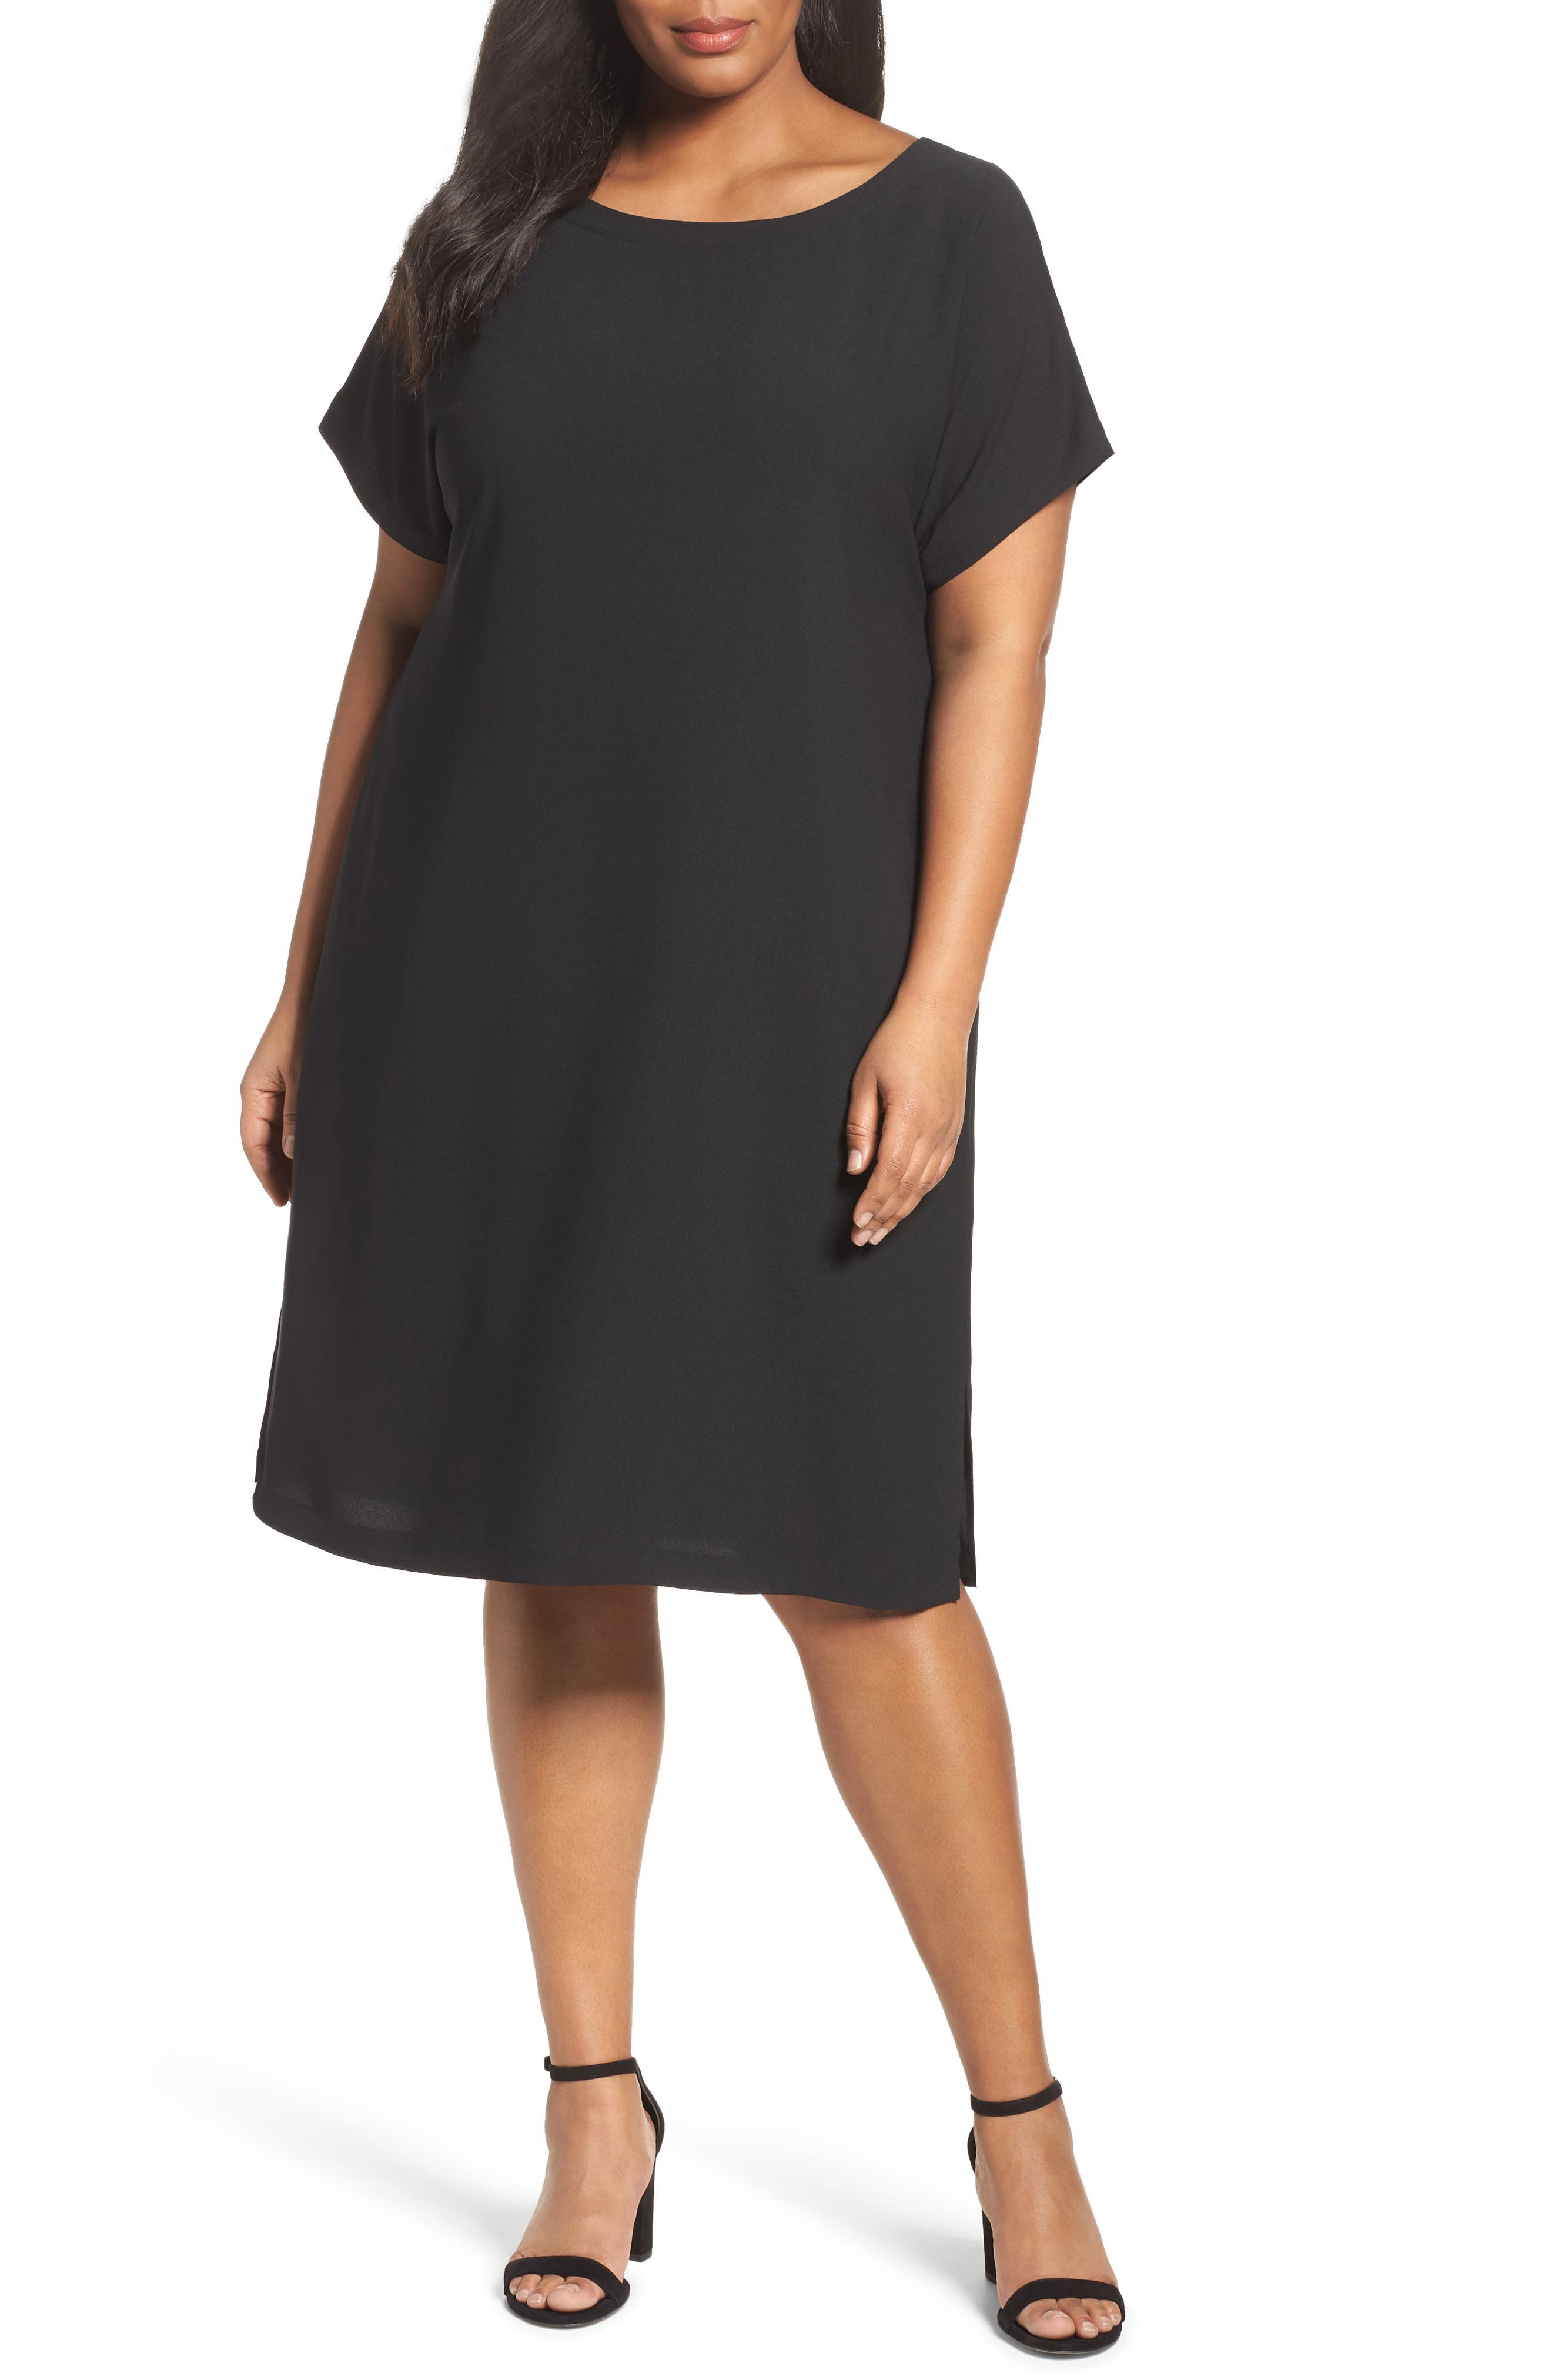 Long black dress size 8 batting